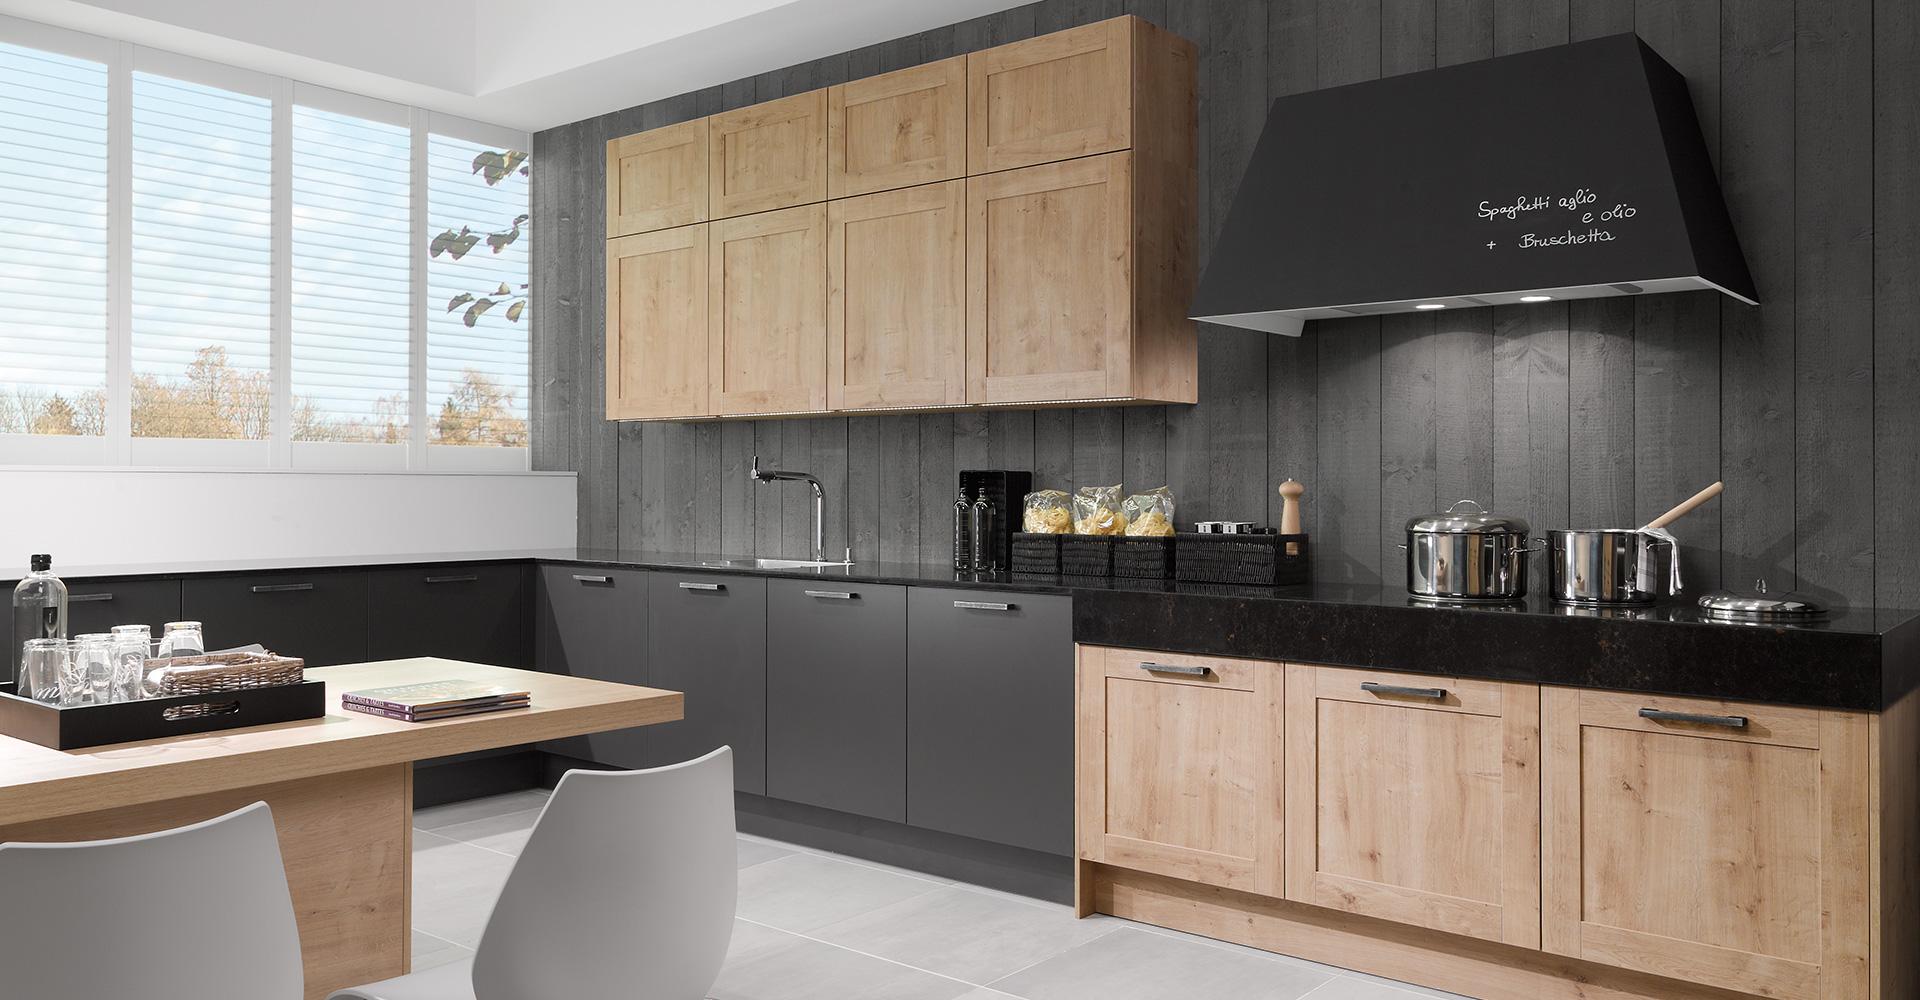 Keuken Landelijk Modern : Keukens landelijk tijdloos of modern otten keukens sanitair